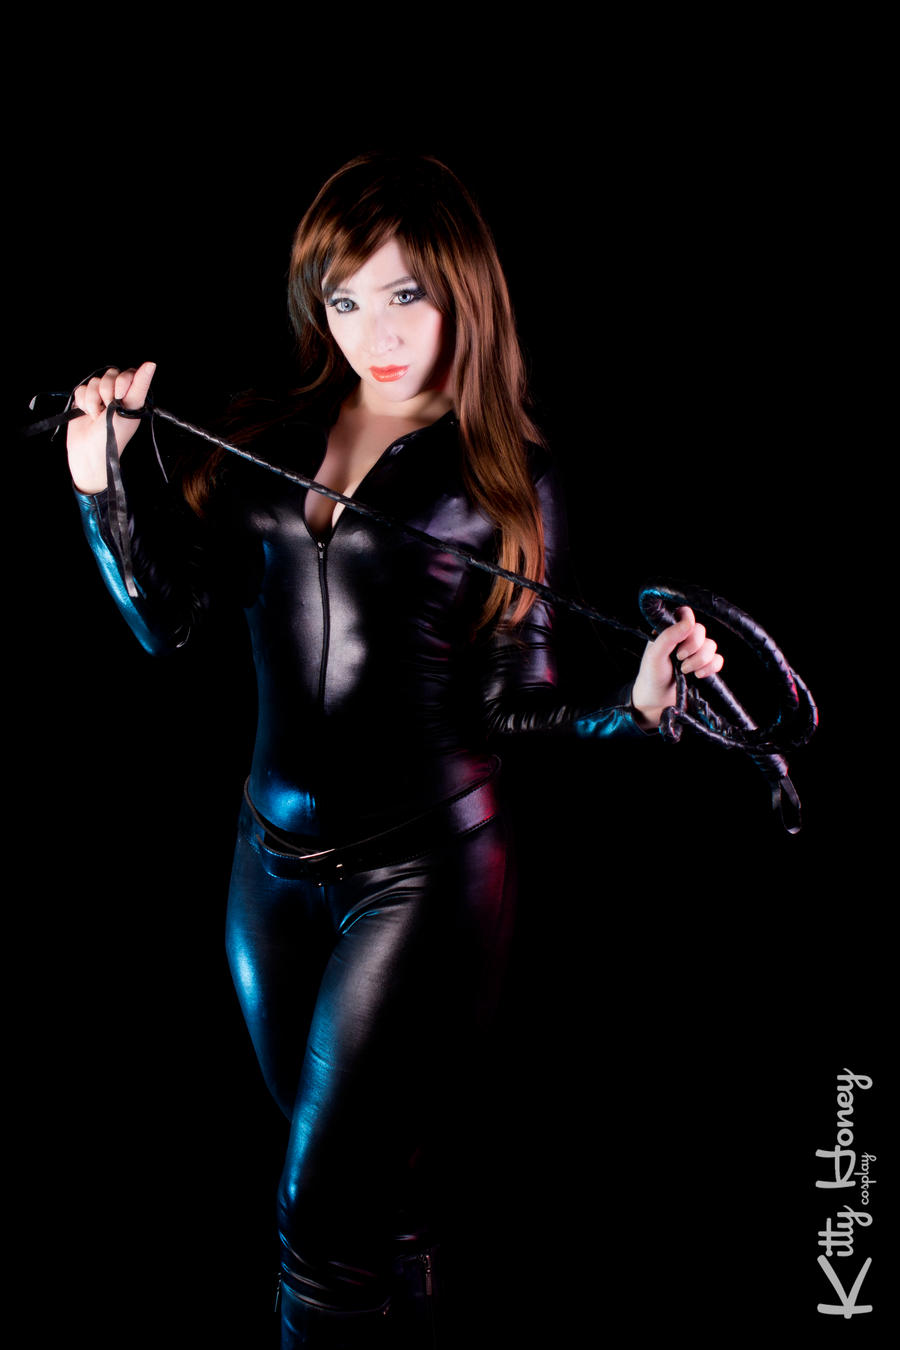 Danger Girl 01 - Sydney Savage Cosplay by Kitty-Honey